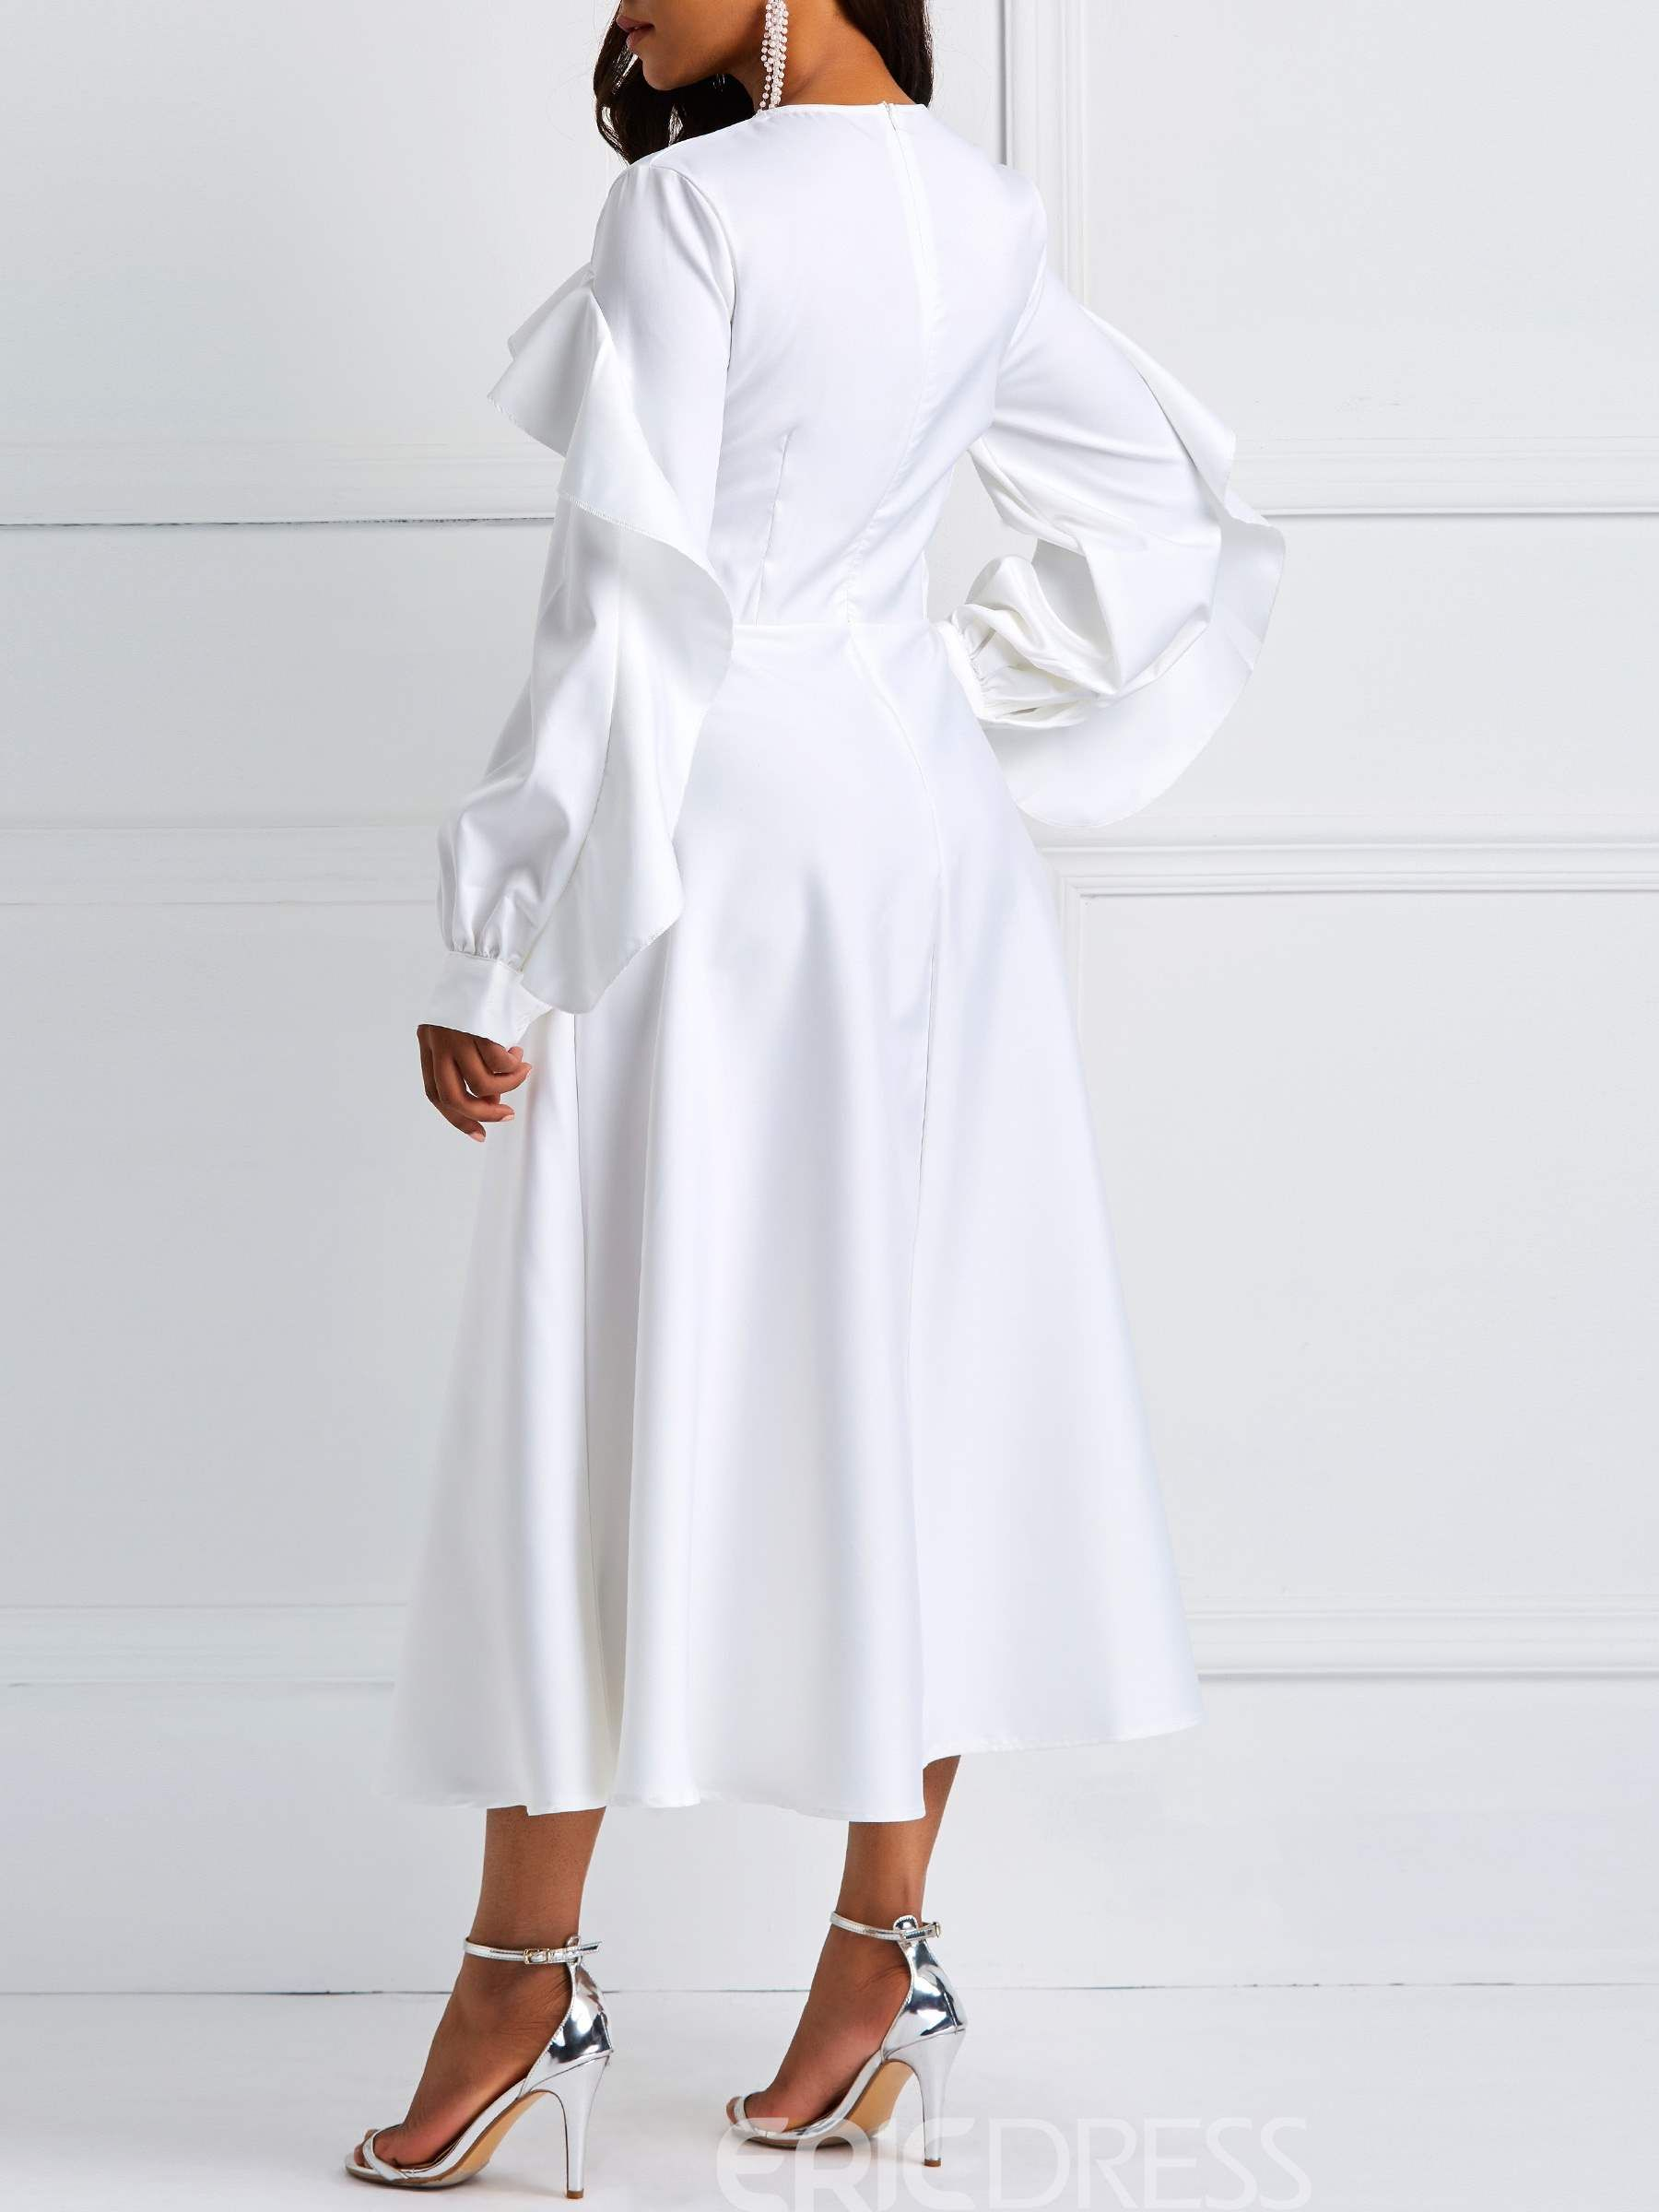 b8193ac59fb6e Ericdress Long Sleeve Ruffles A-Line White Dresses 13557408 ...